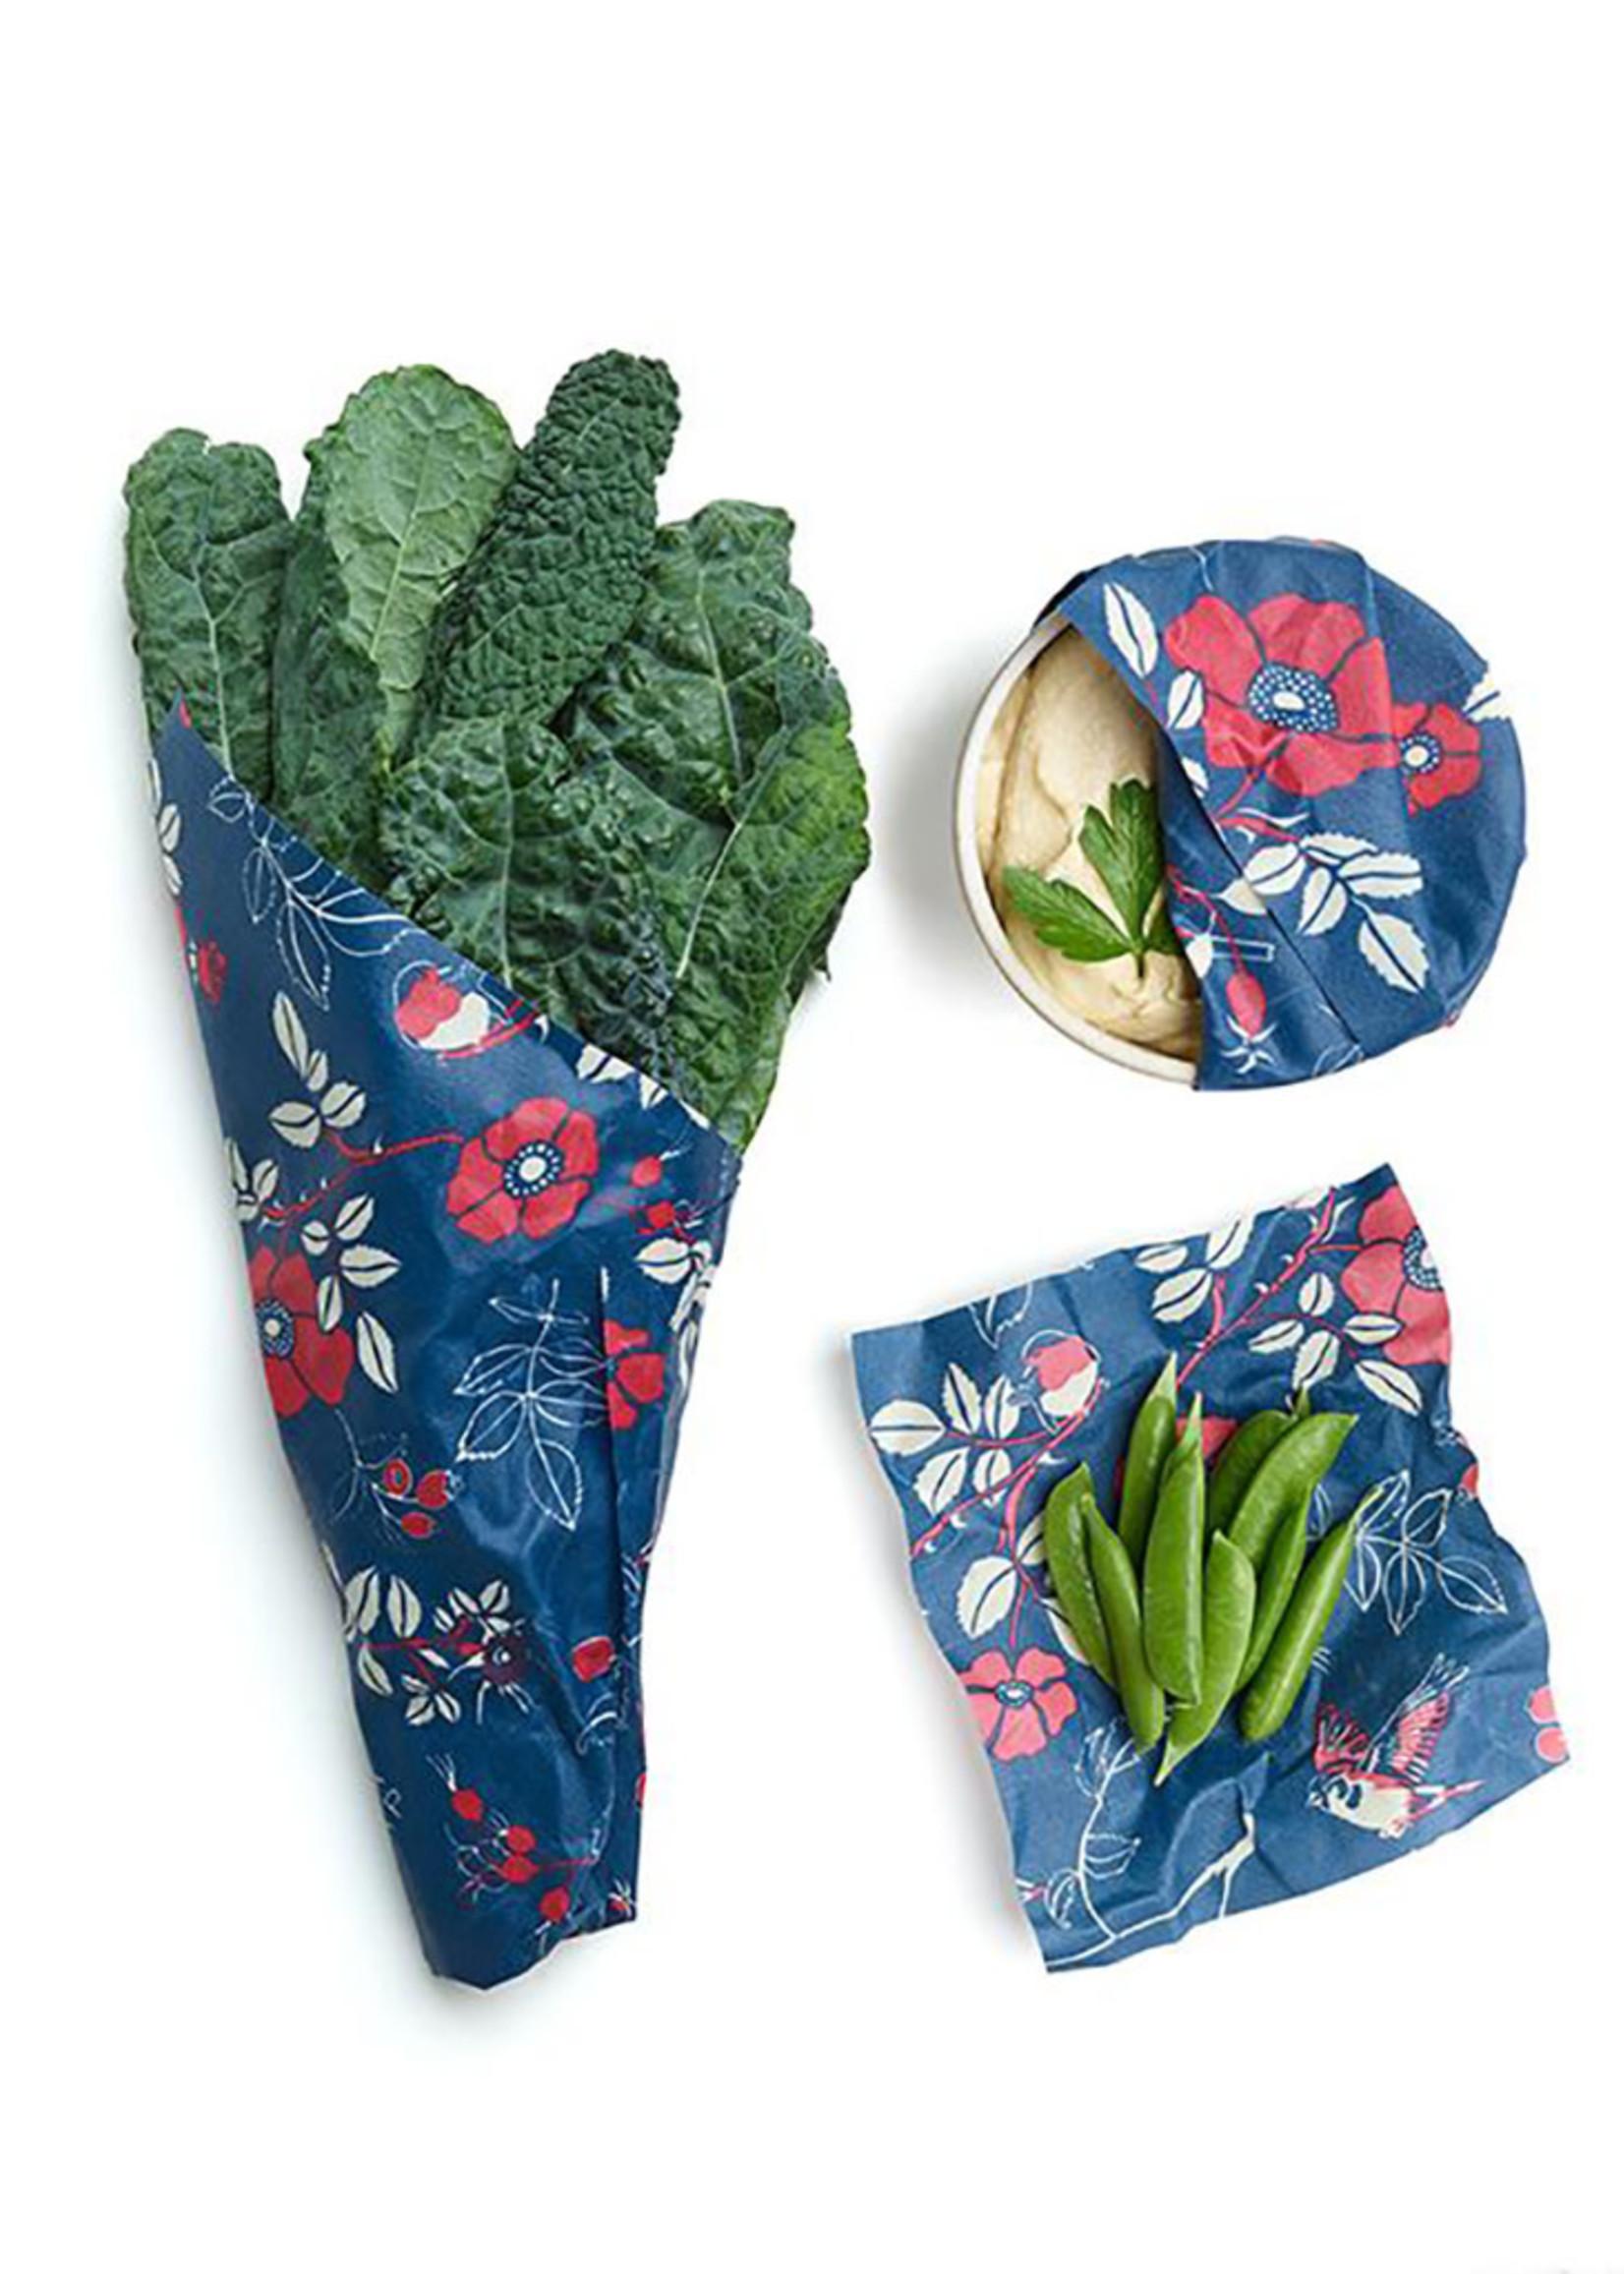 Bee's Wrap Botanical Design Food Wrap Set of 3